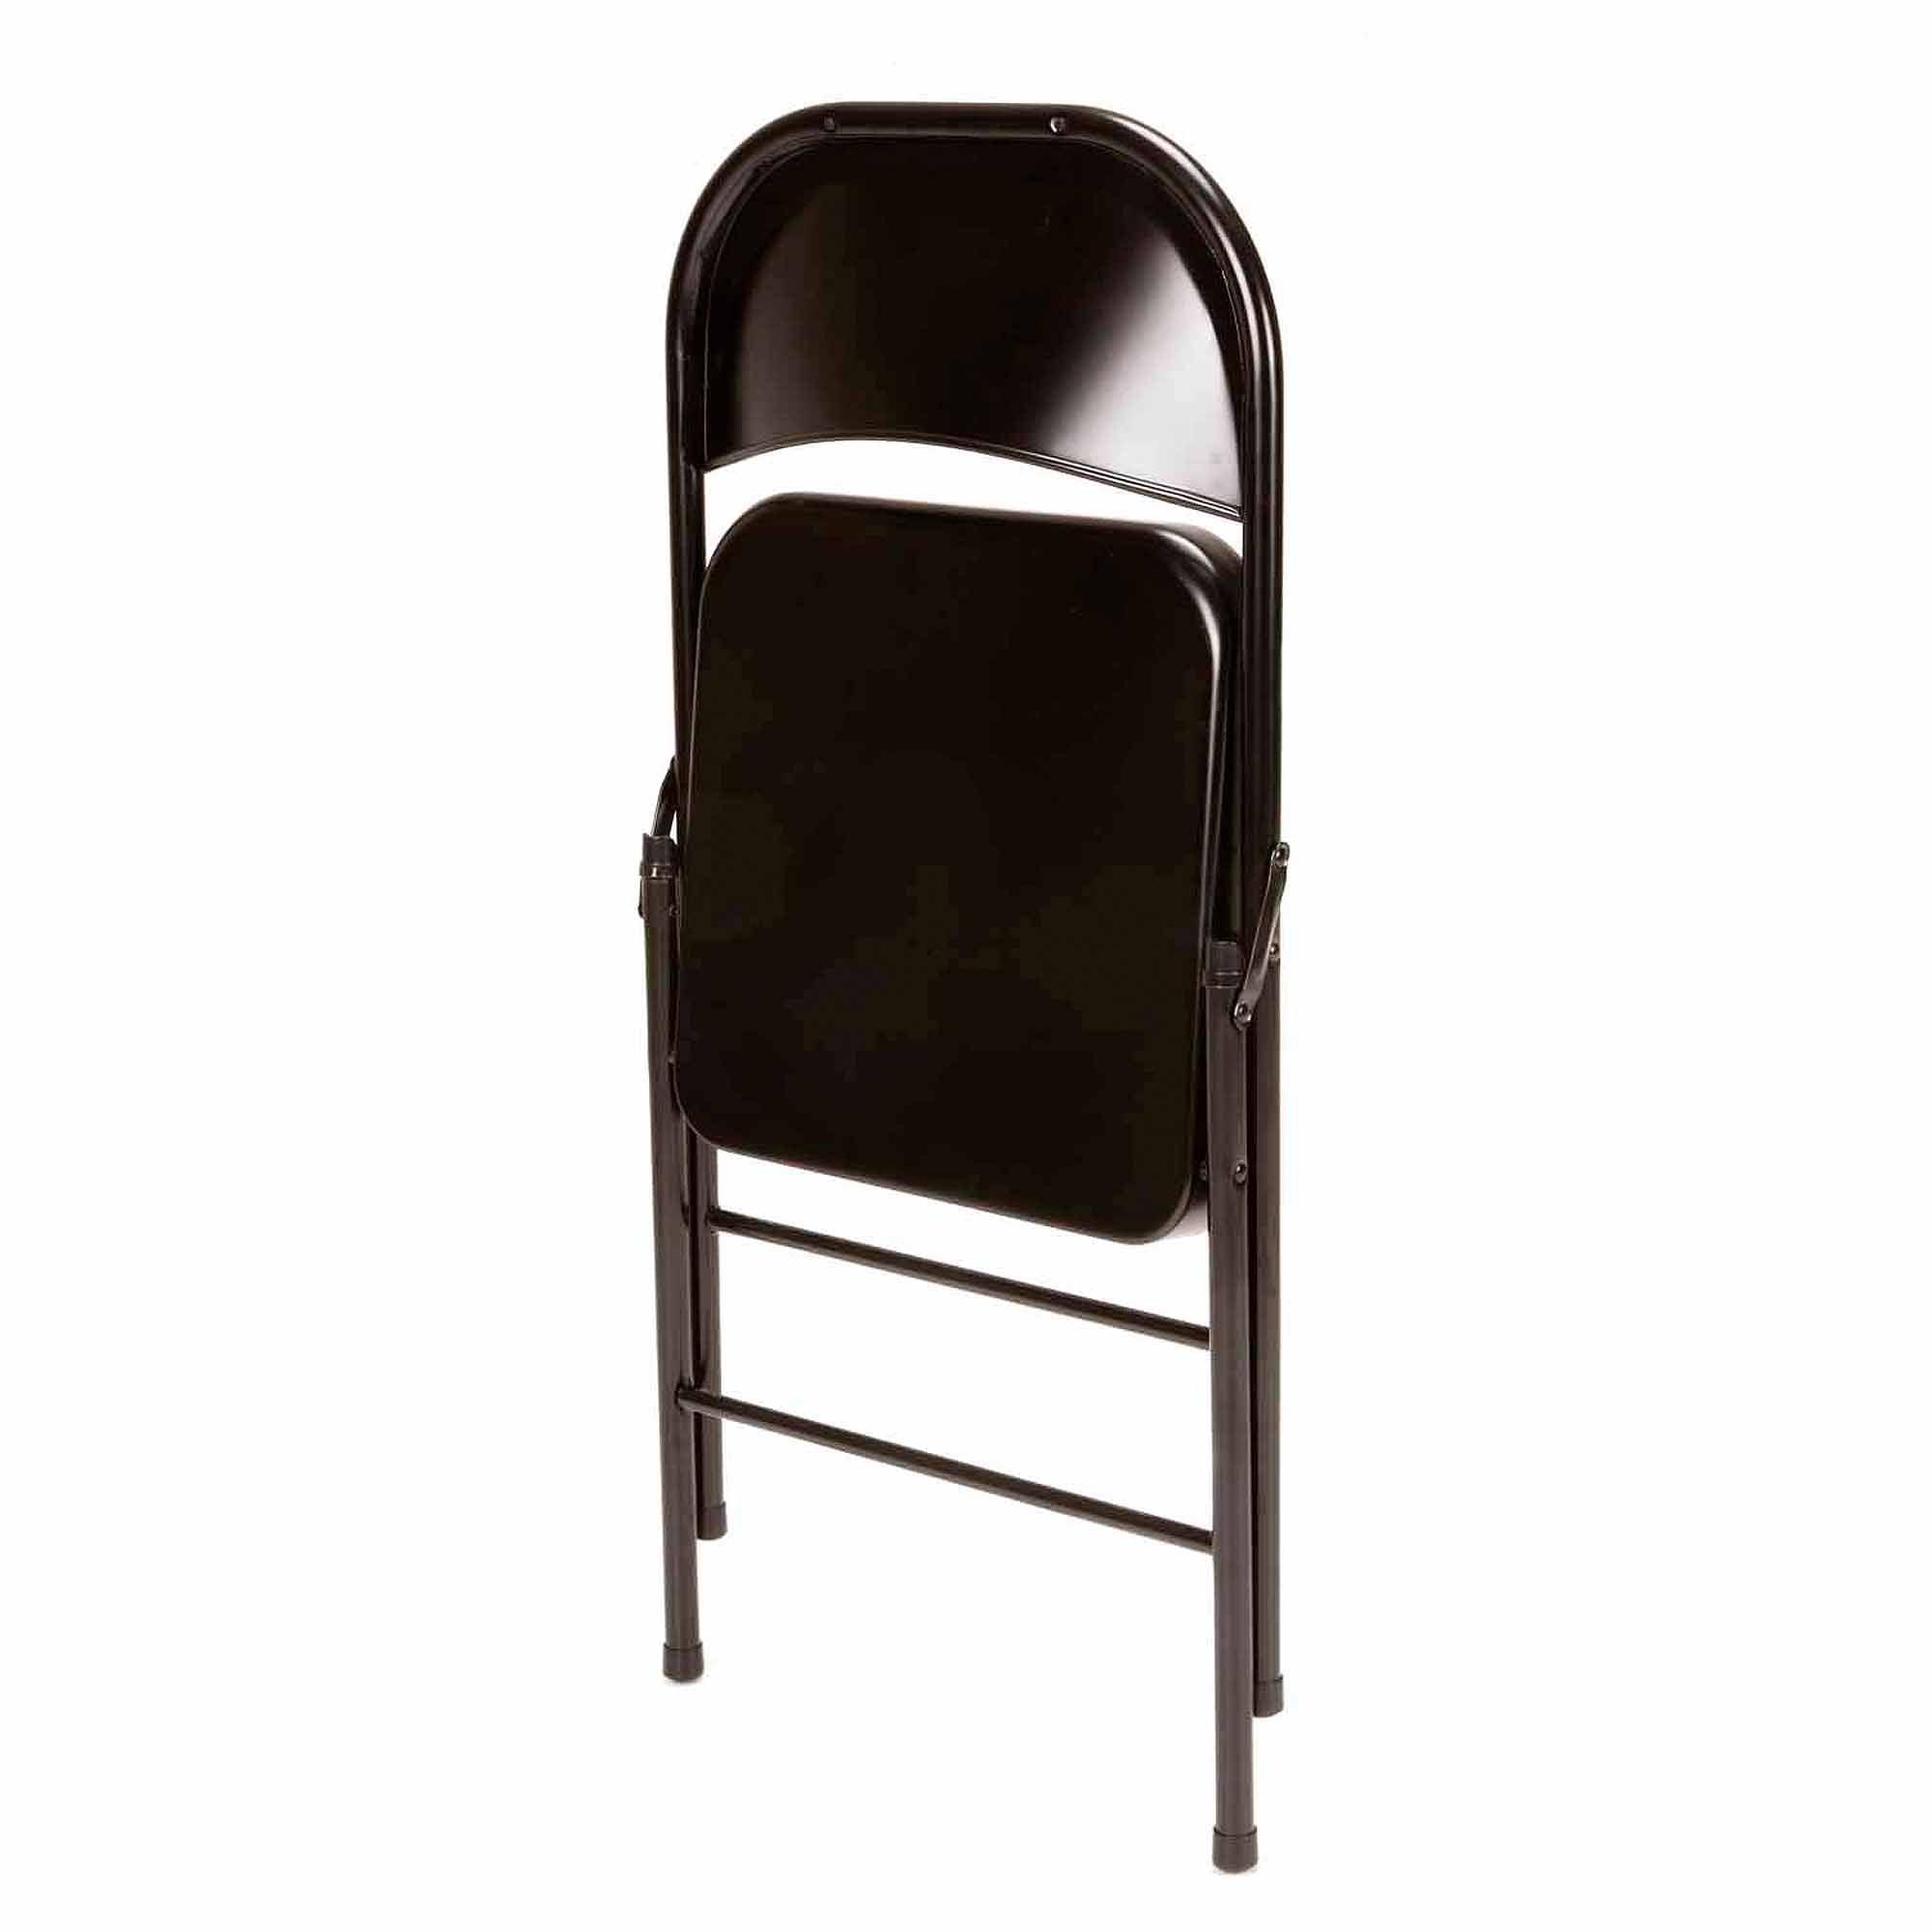 Mainstays Steel Chair Set of 4 Multiple Colors Walmart